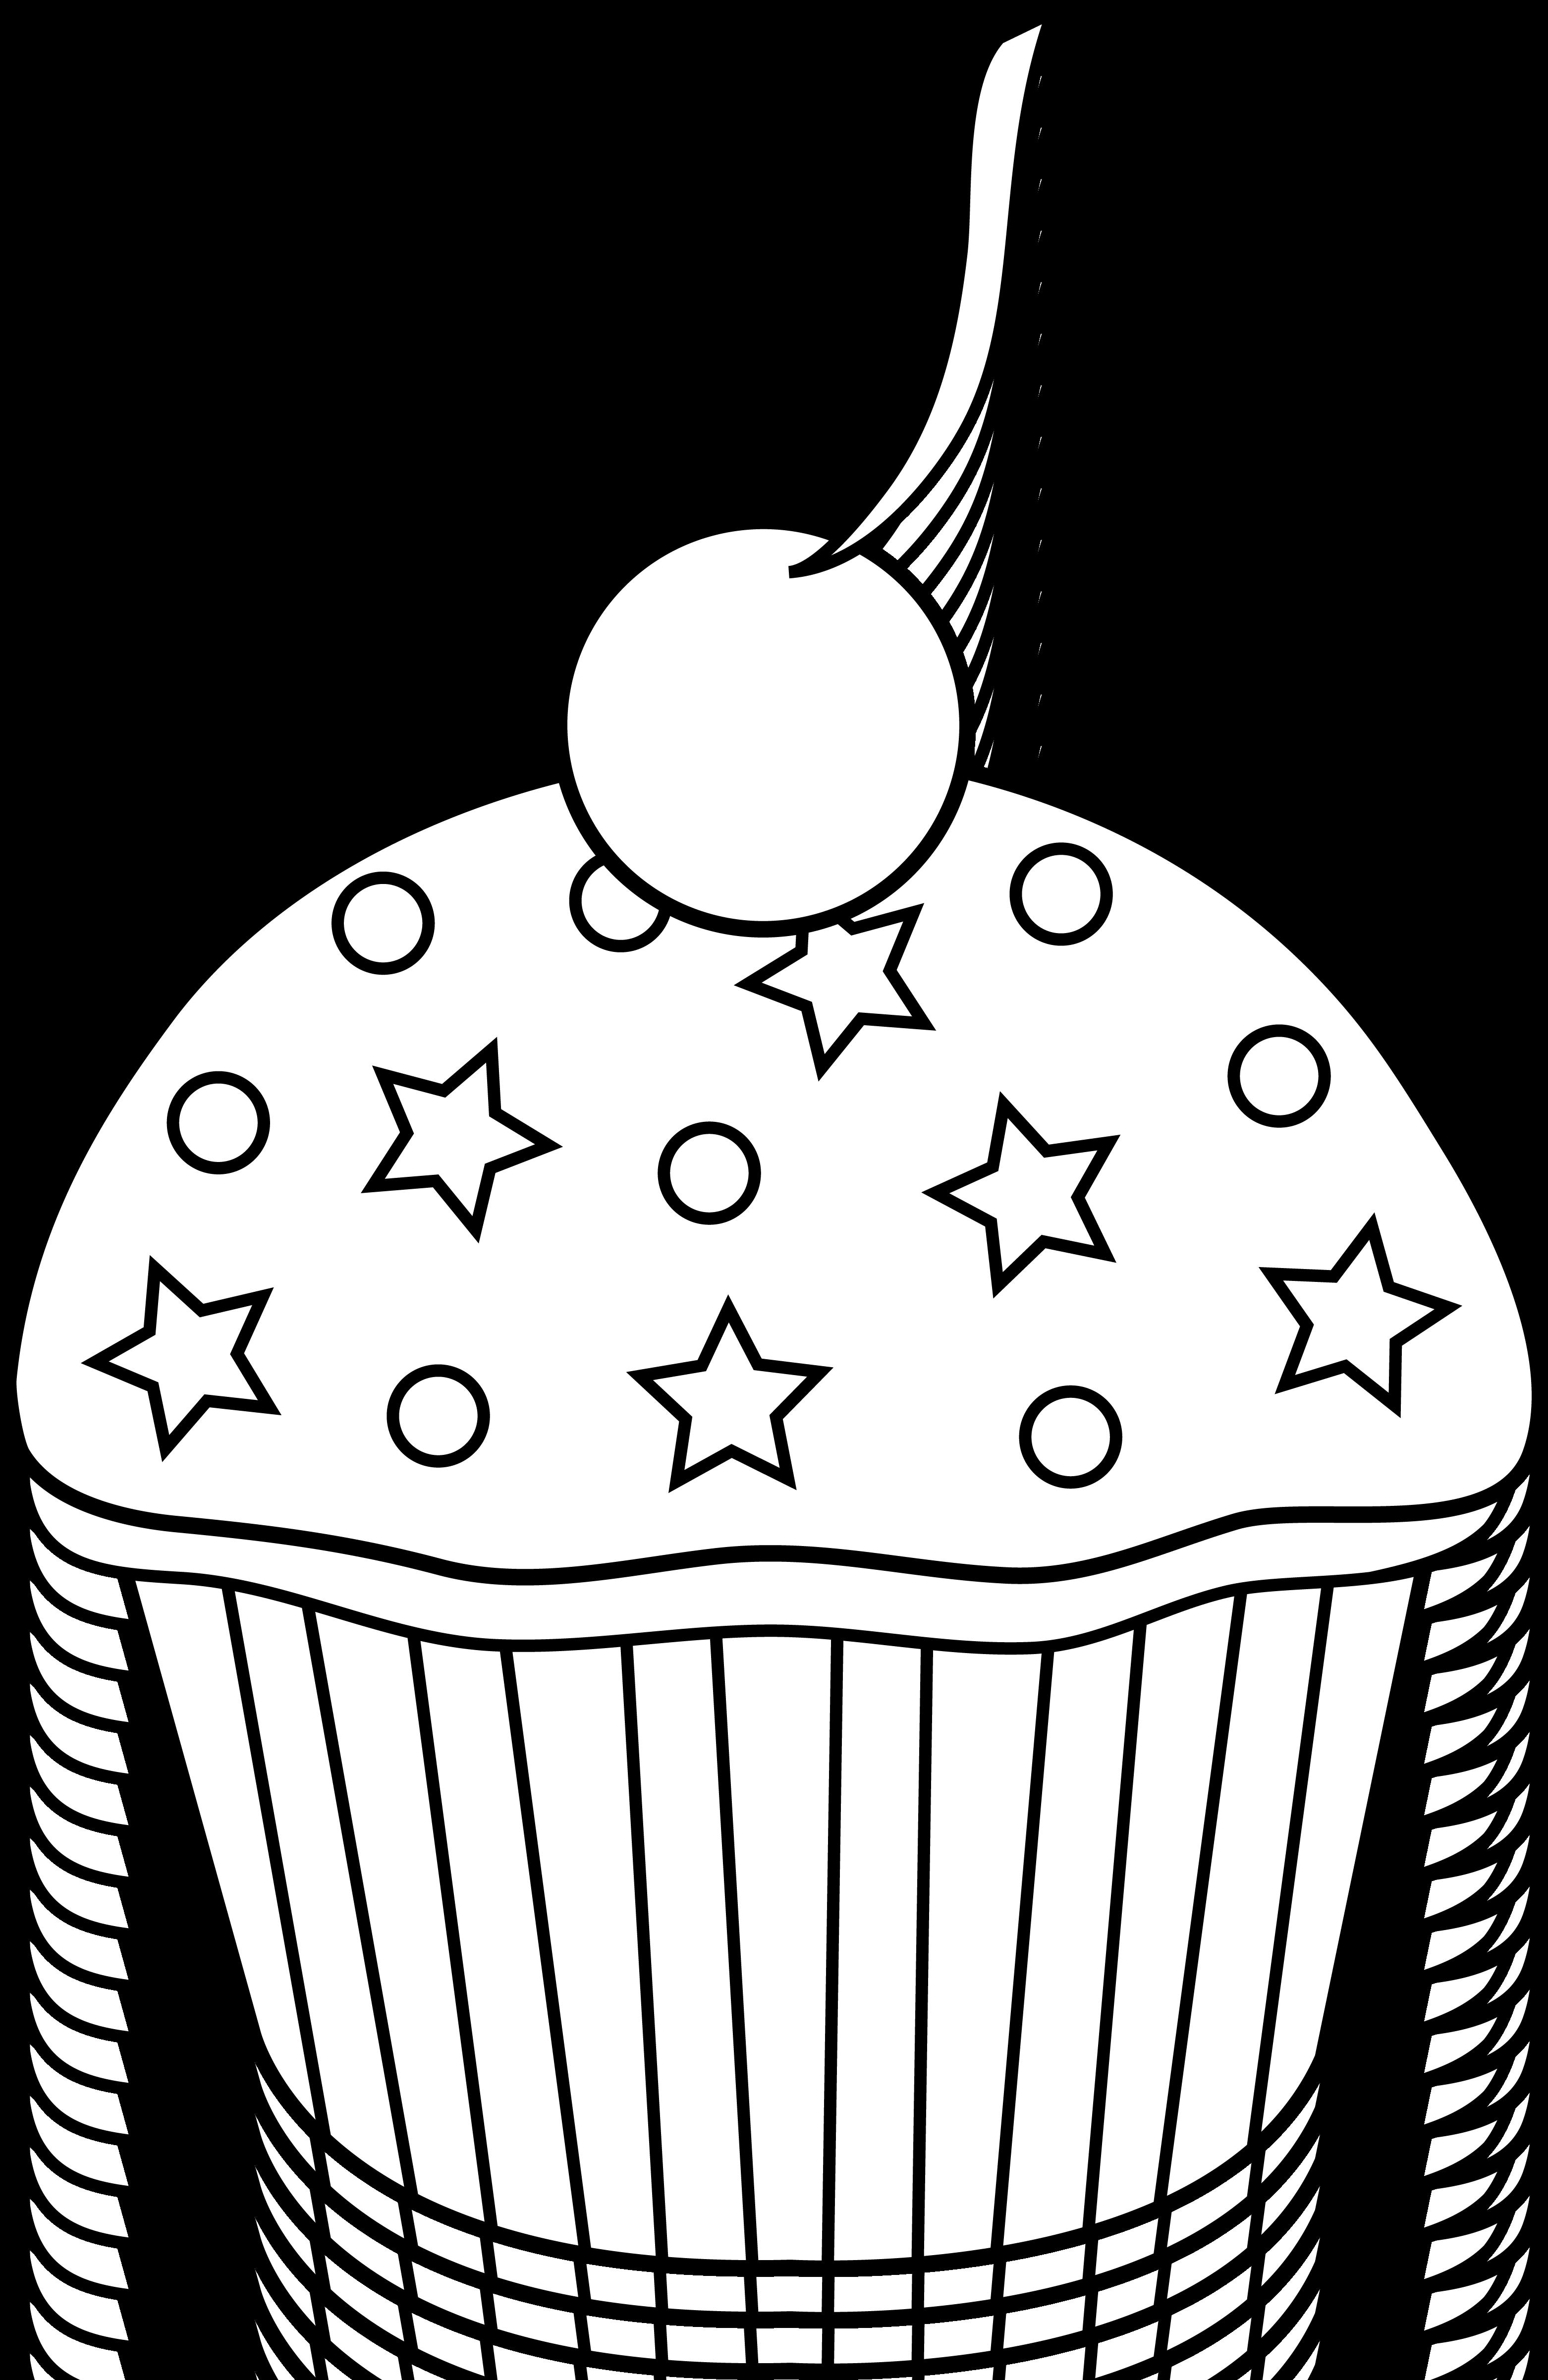 Owl clipart cupcake. Cute colorable design free